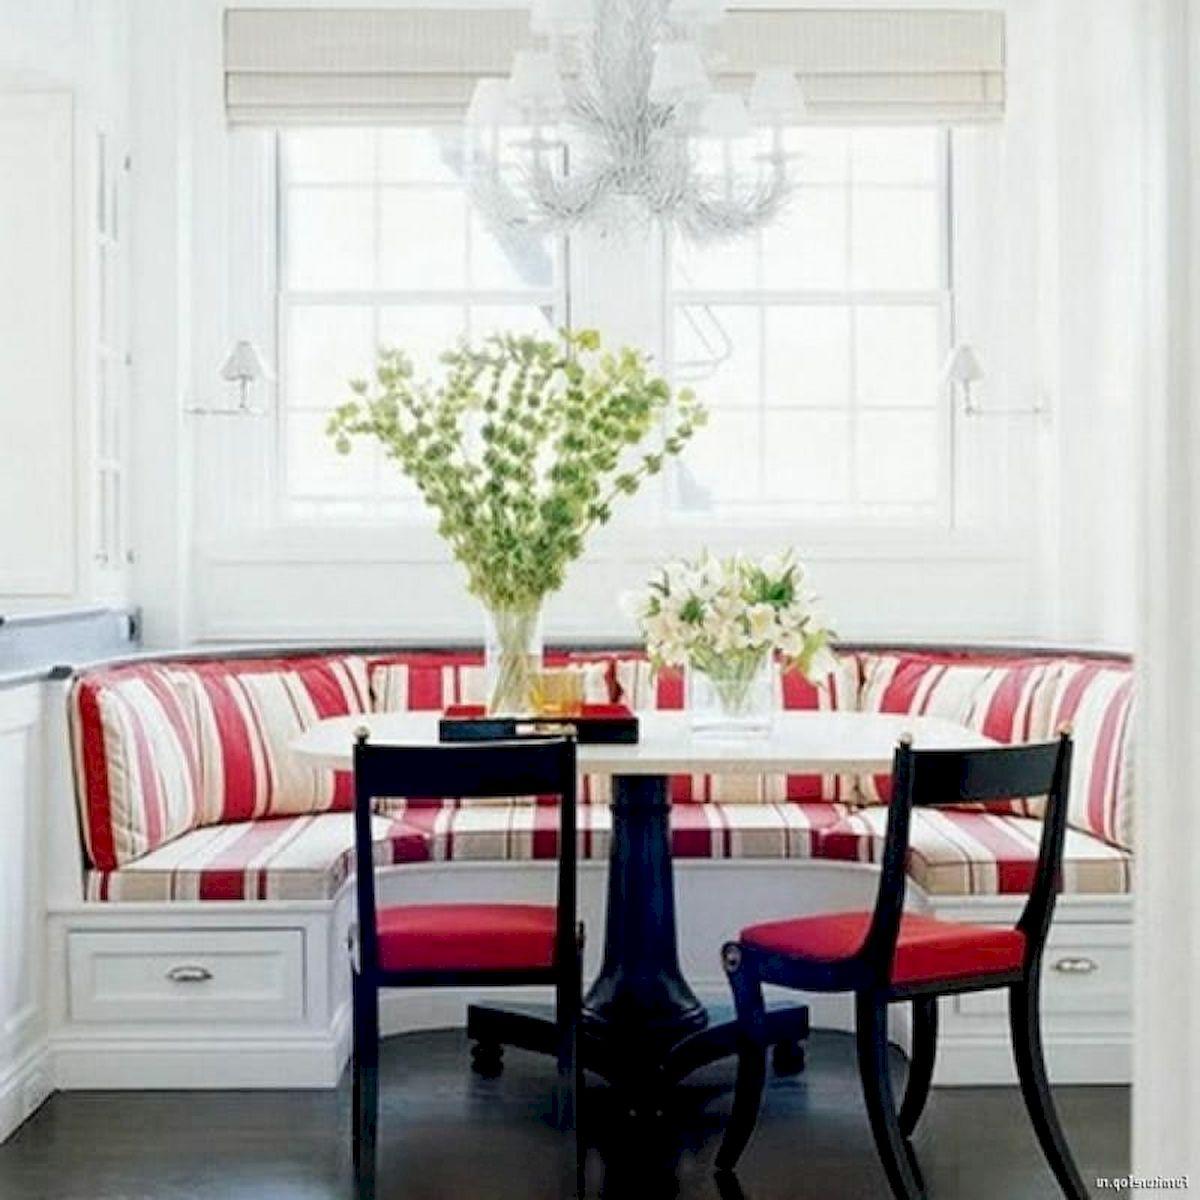 45 Colorful Interior Home Design and Decor Ideas (14)